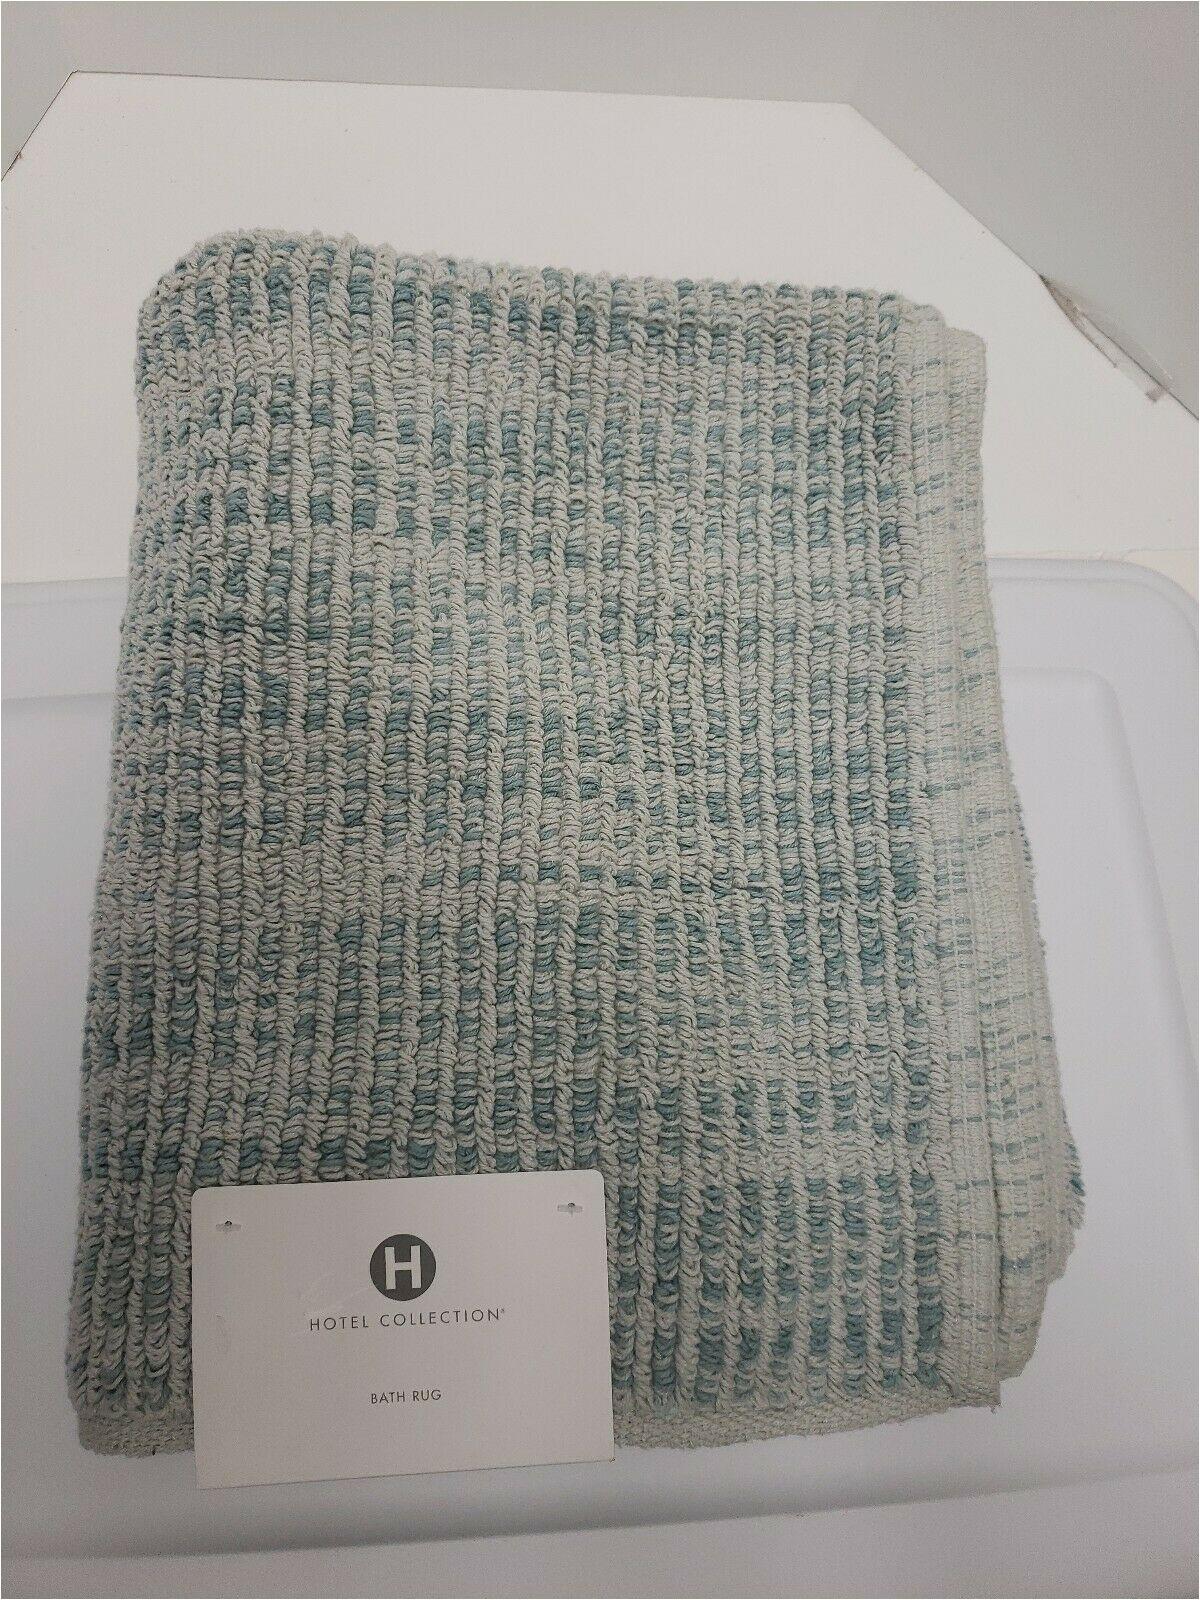 "Wamsutta Reversible Cotton Bath Rugs Hotel Collection Fashion 30"" X 50"" Textured Flat Weave Cotton Bath Rug Aqua"